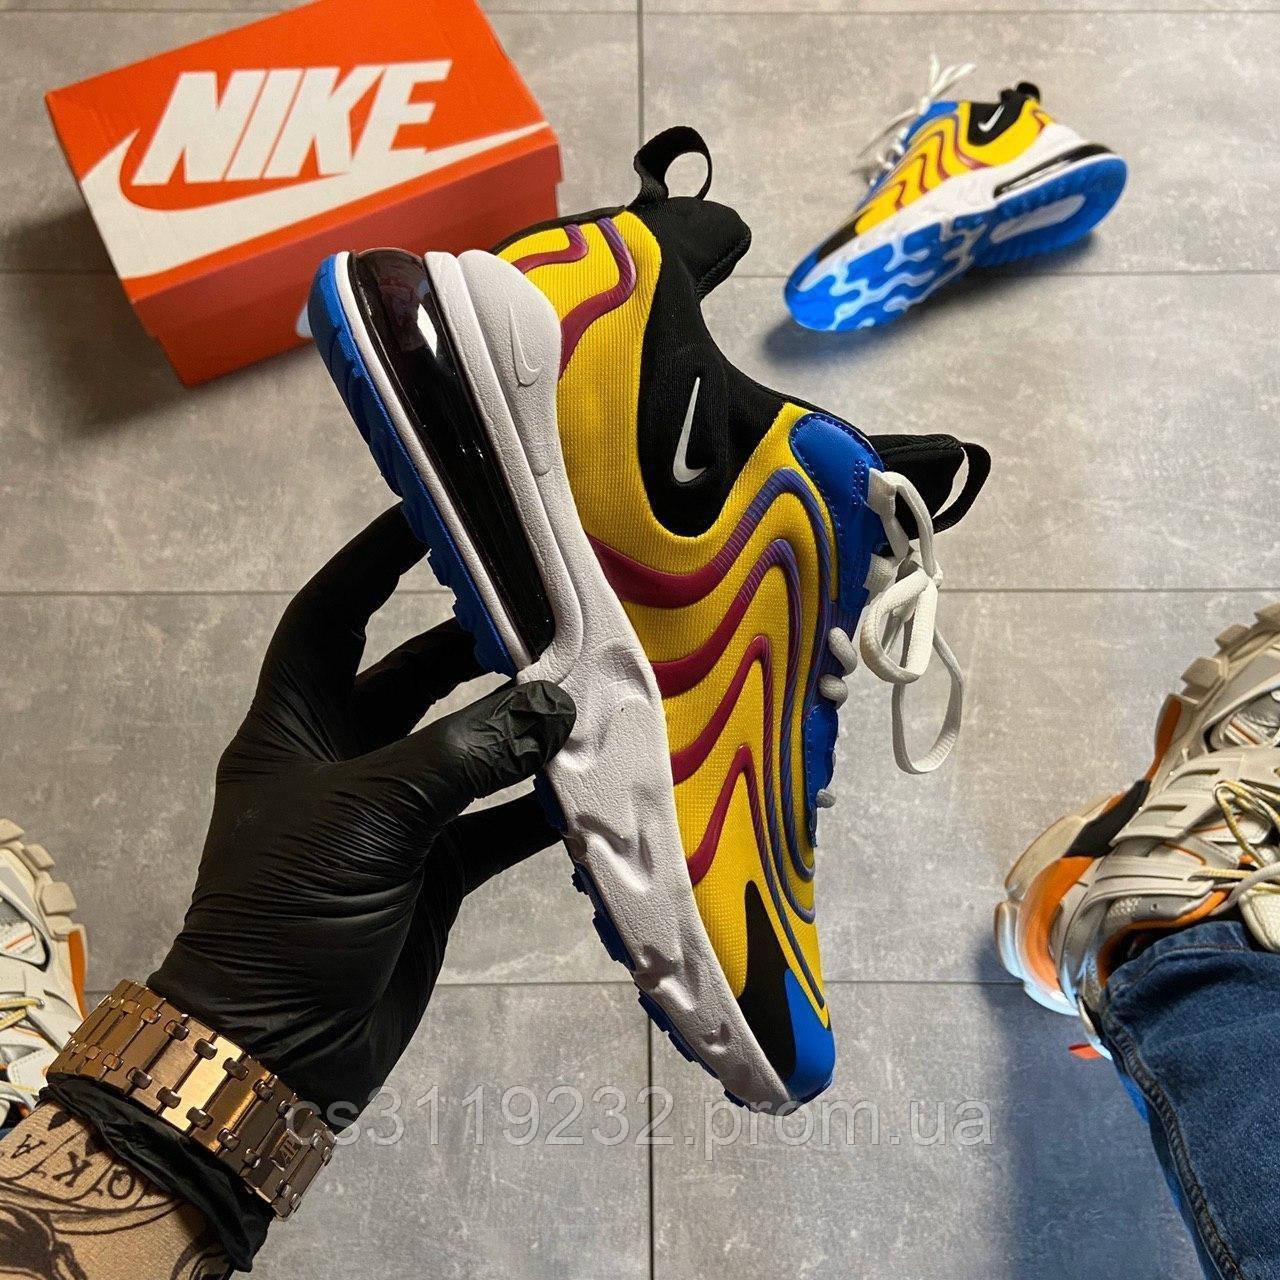 Мужские кроссовки Nike Air Max 270 React Eng Yellow Blue (желто-голубые)